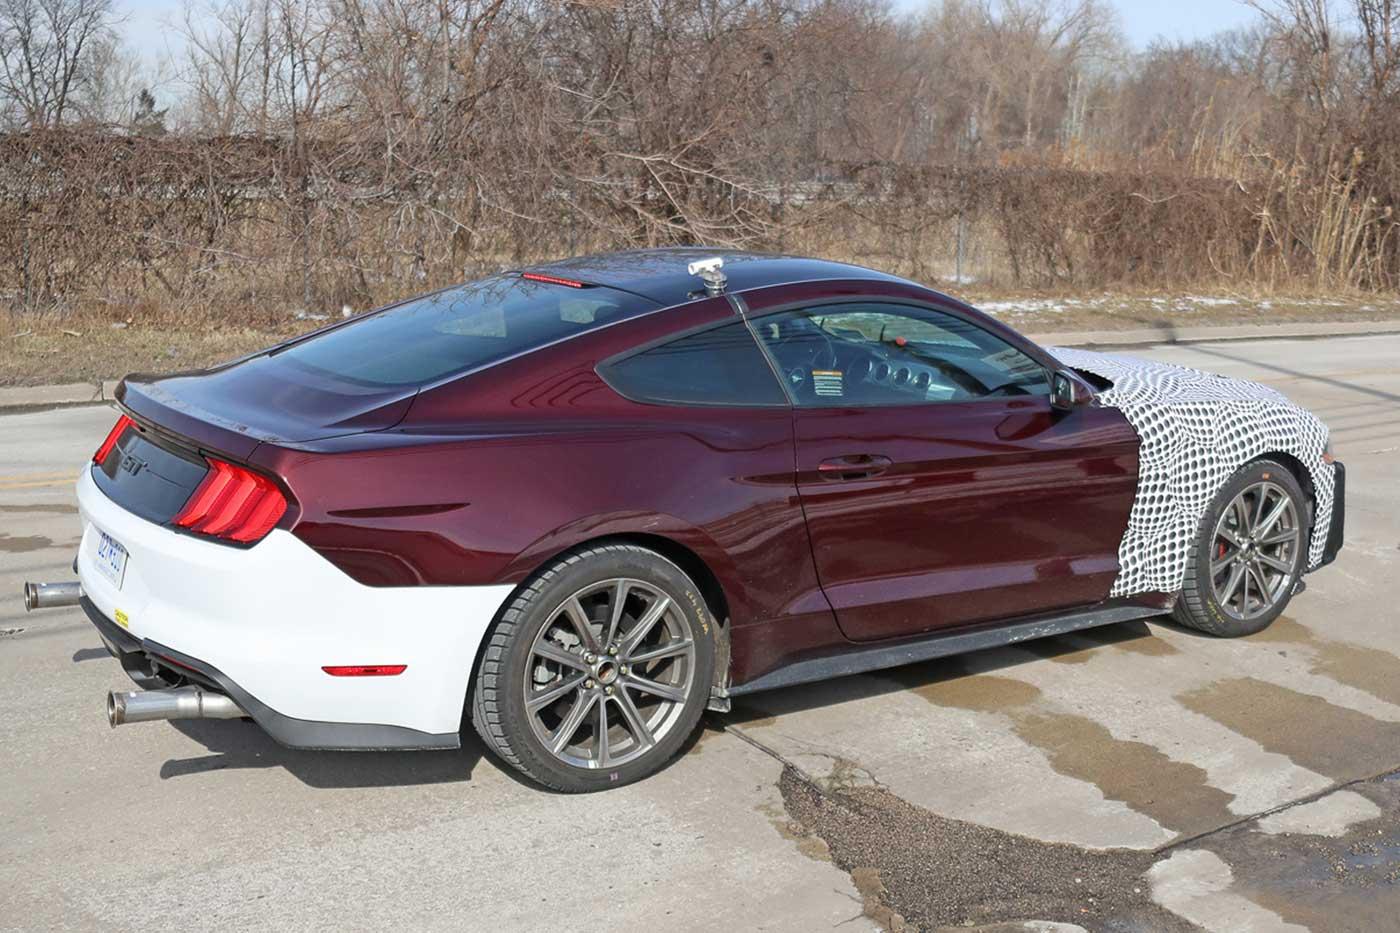 2020-21-Mustang-Refresh-Hybrid-Prototype